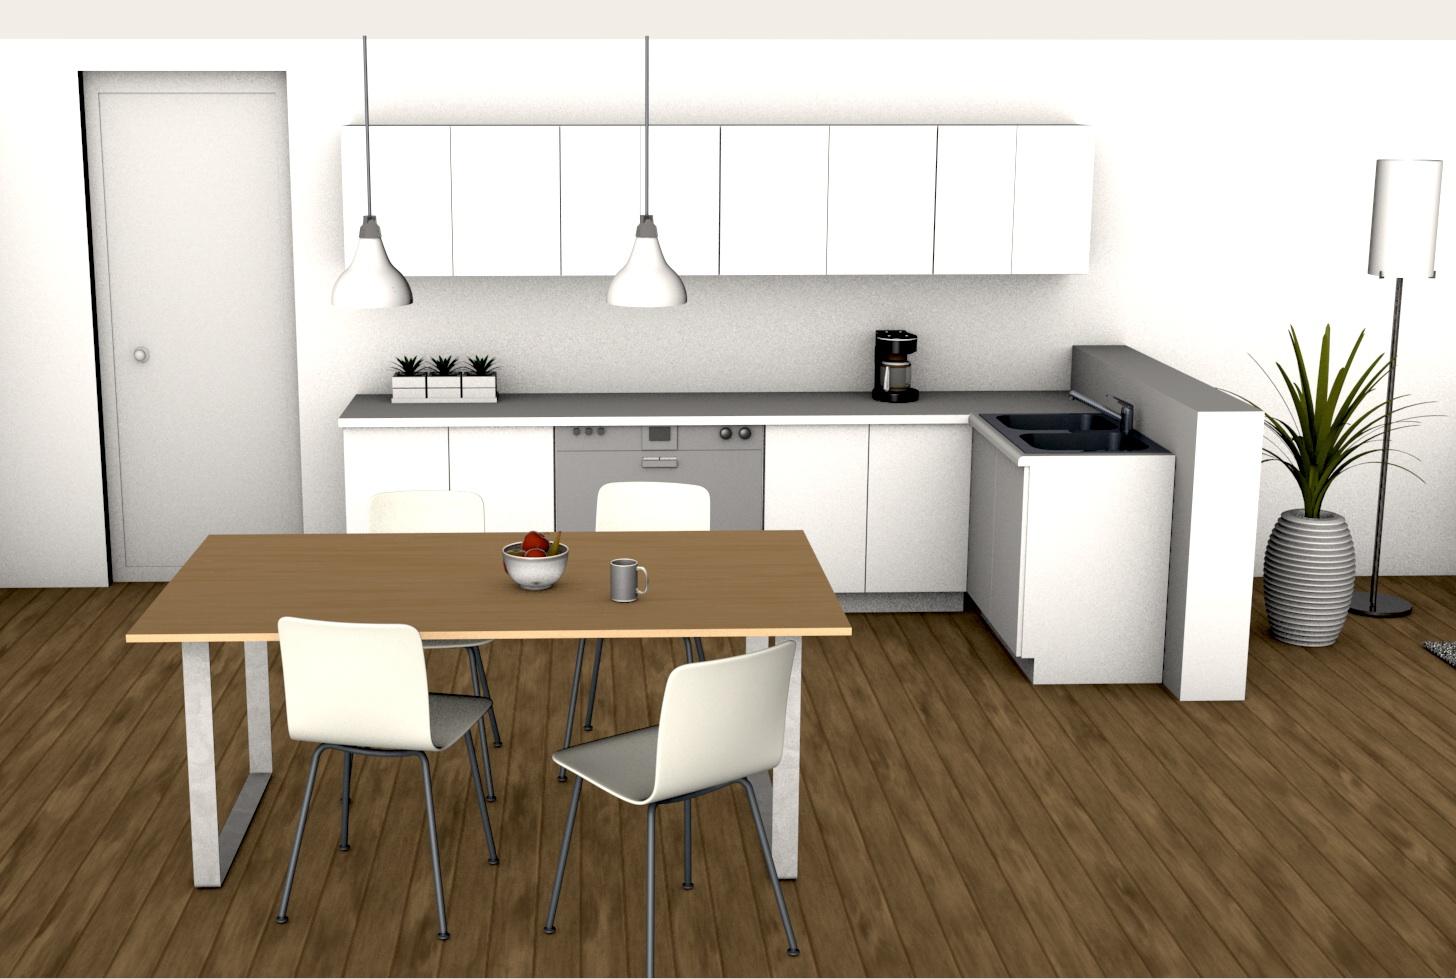 Kitchen_treated-.jpg